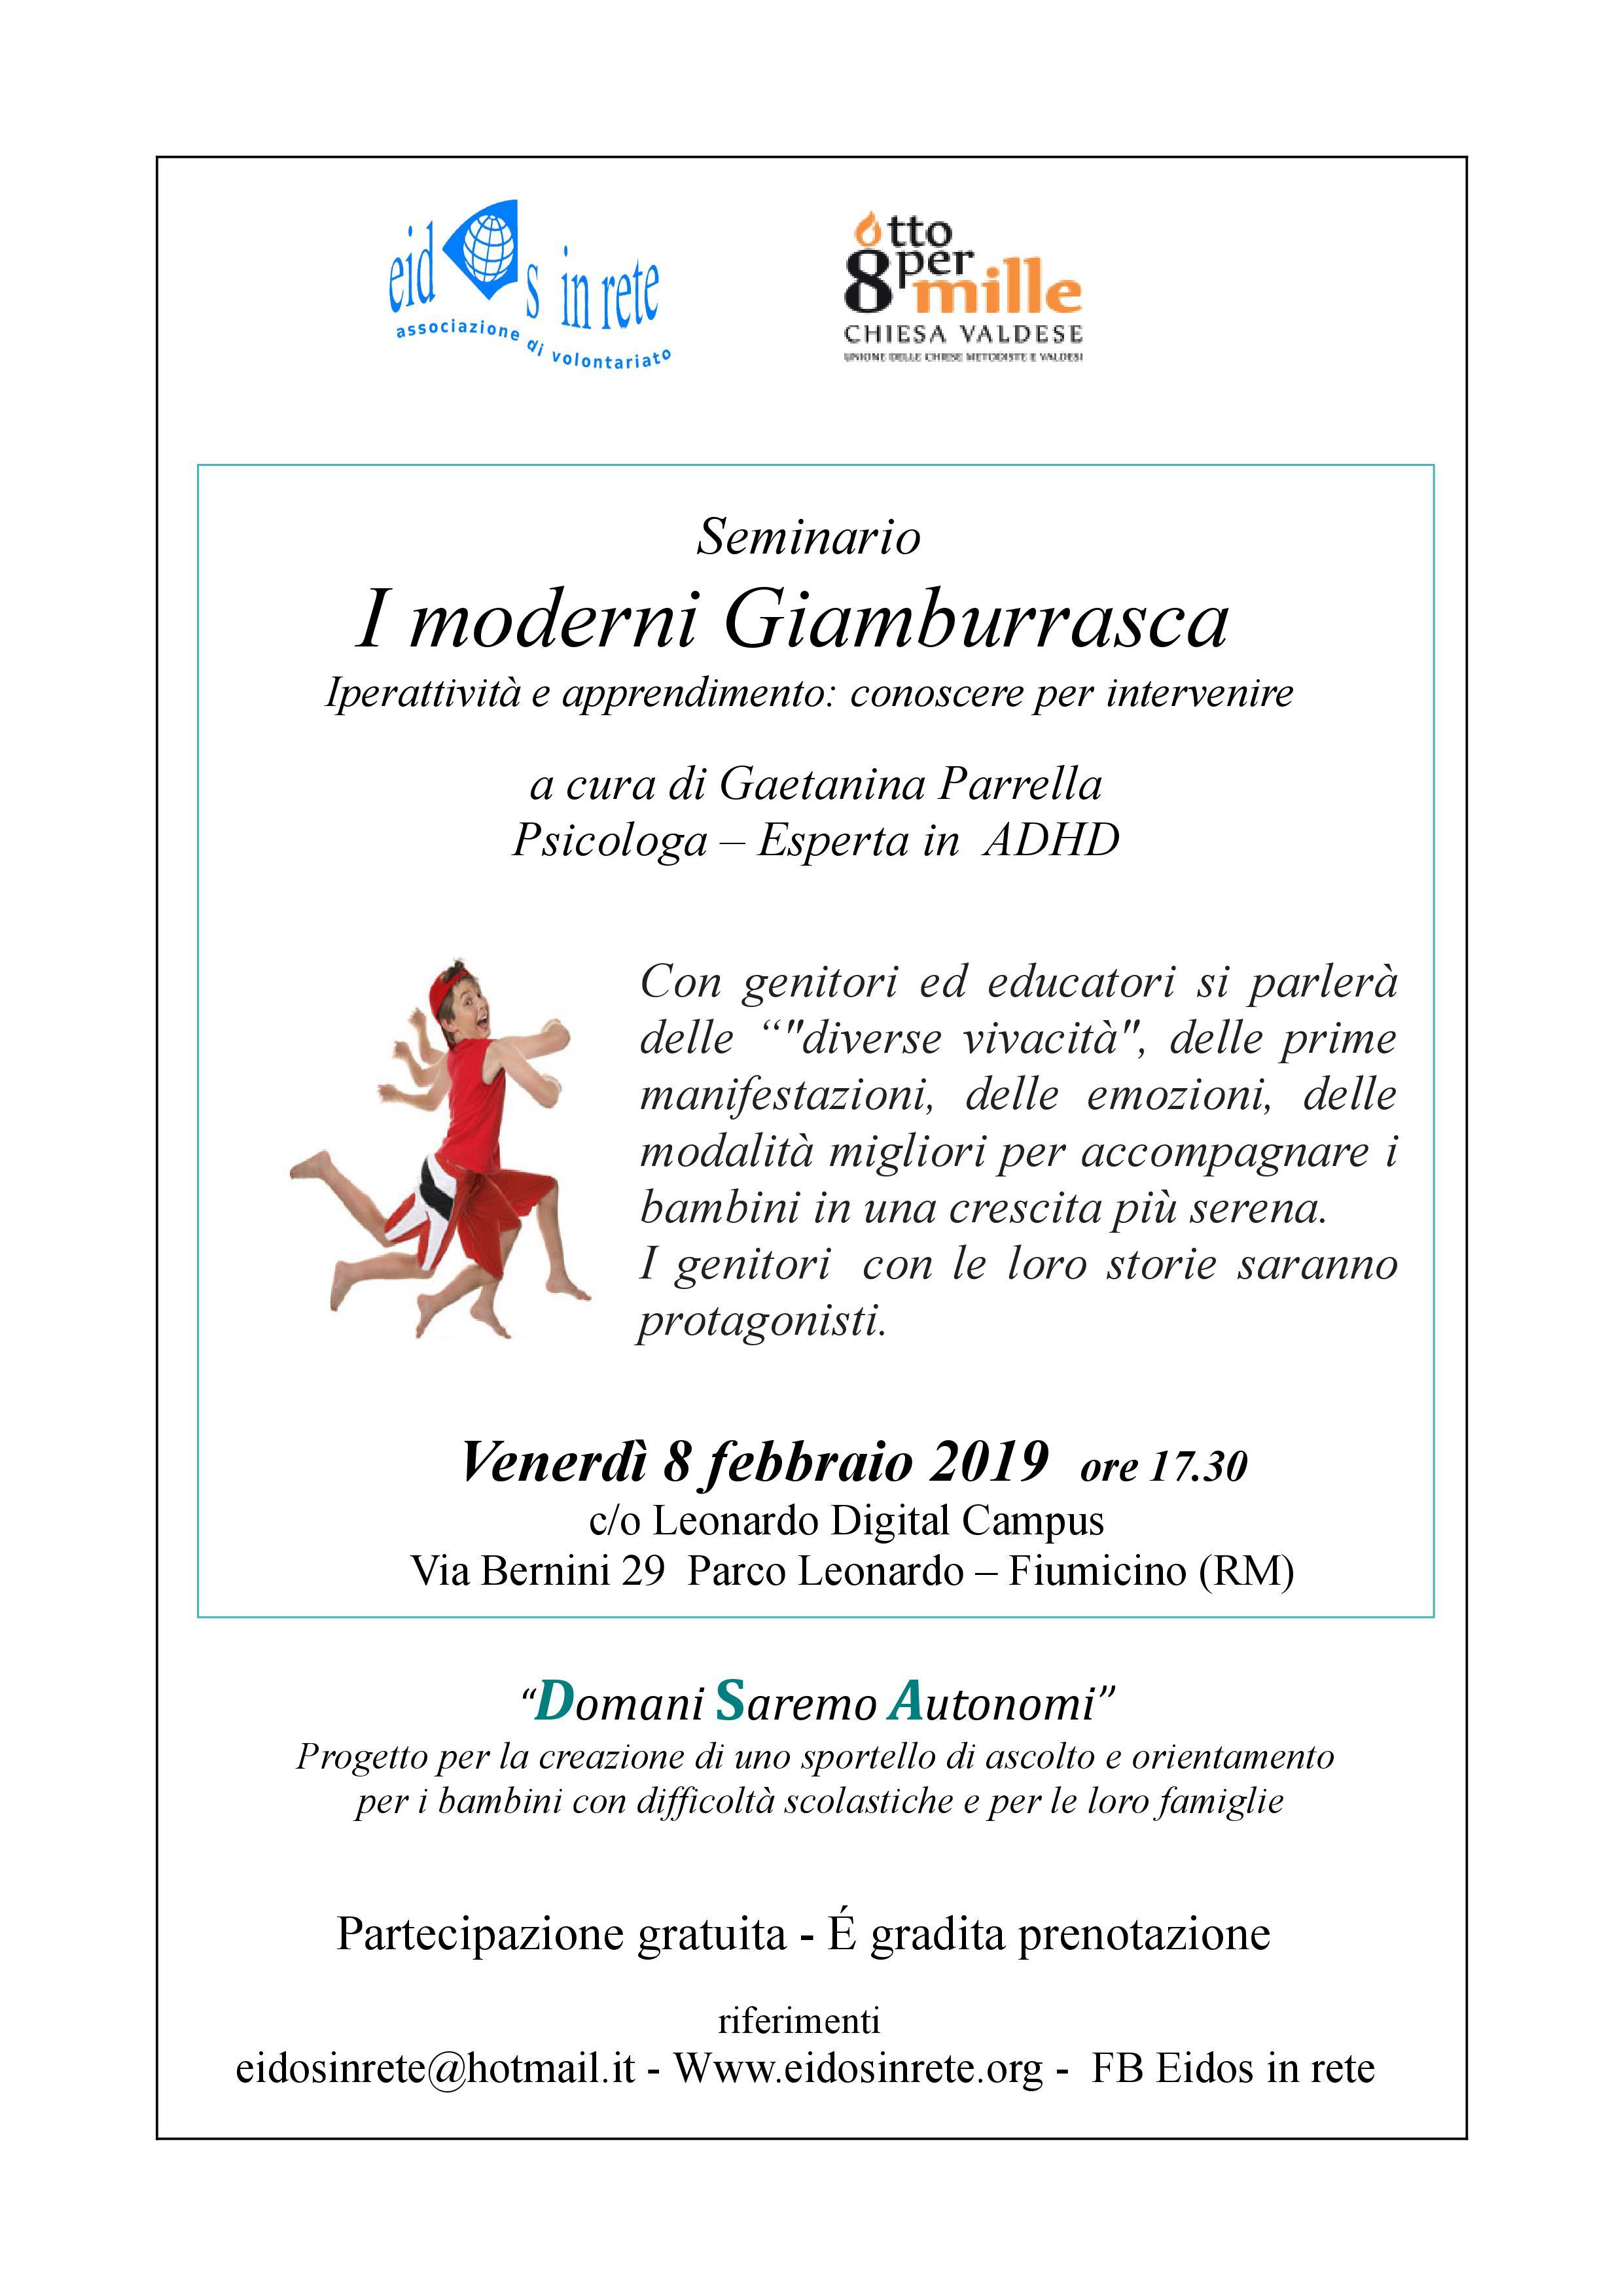 Seminario I moderni Gianburrasca